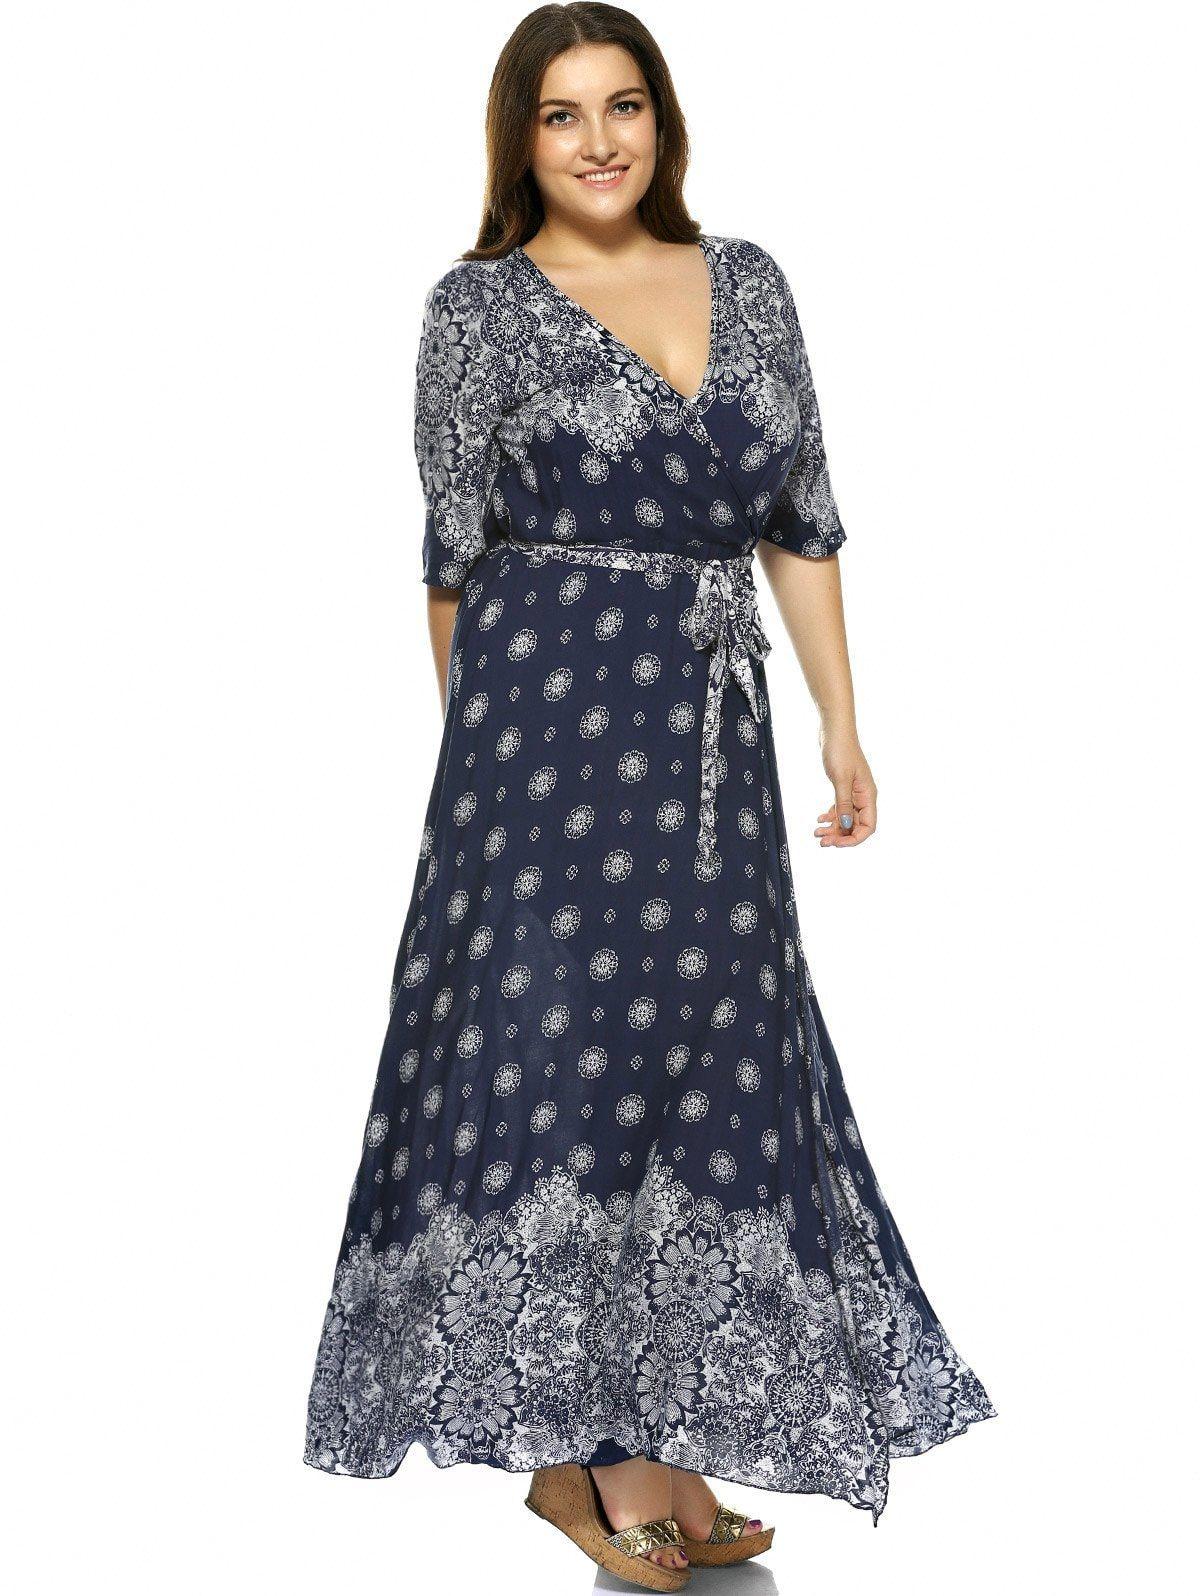 1d93edbc7068b Plus Size Boho Print Flowy Beach Wrap Maxi Dress Use Code  RGBF1 Get 25%  OFF Discount! Jan 8- Jan 14